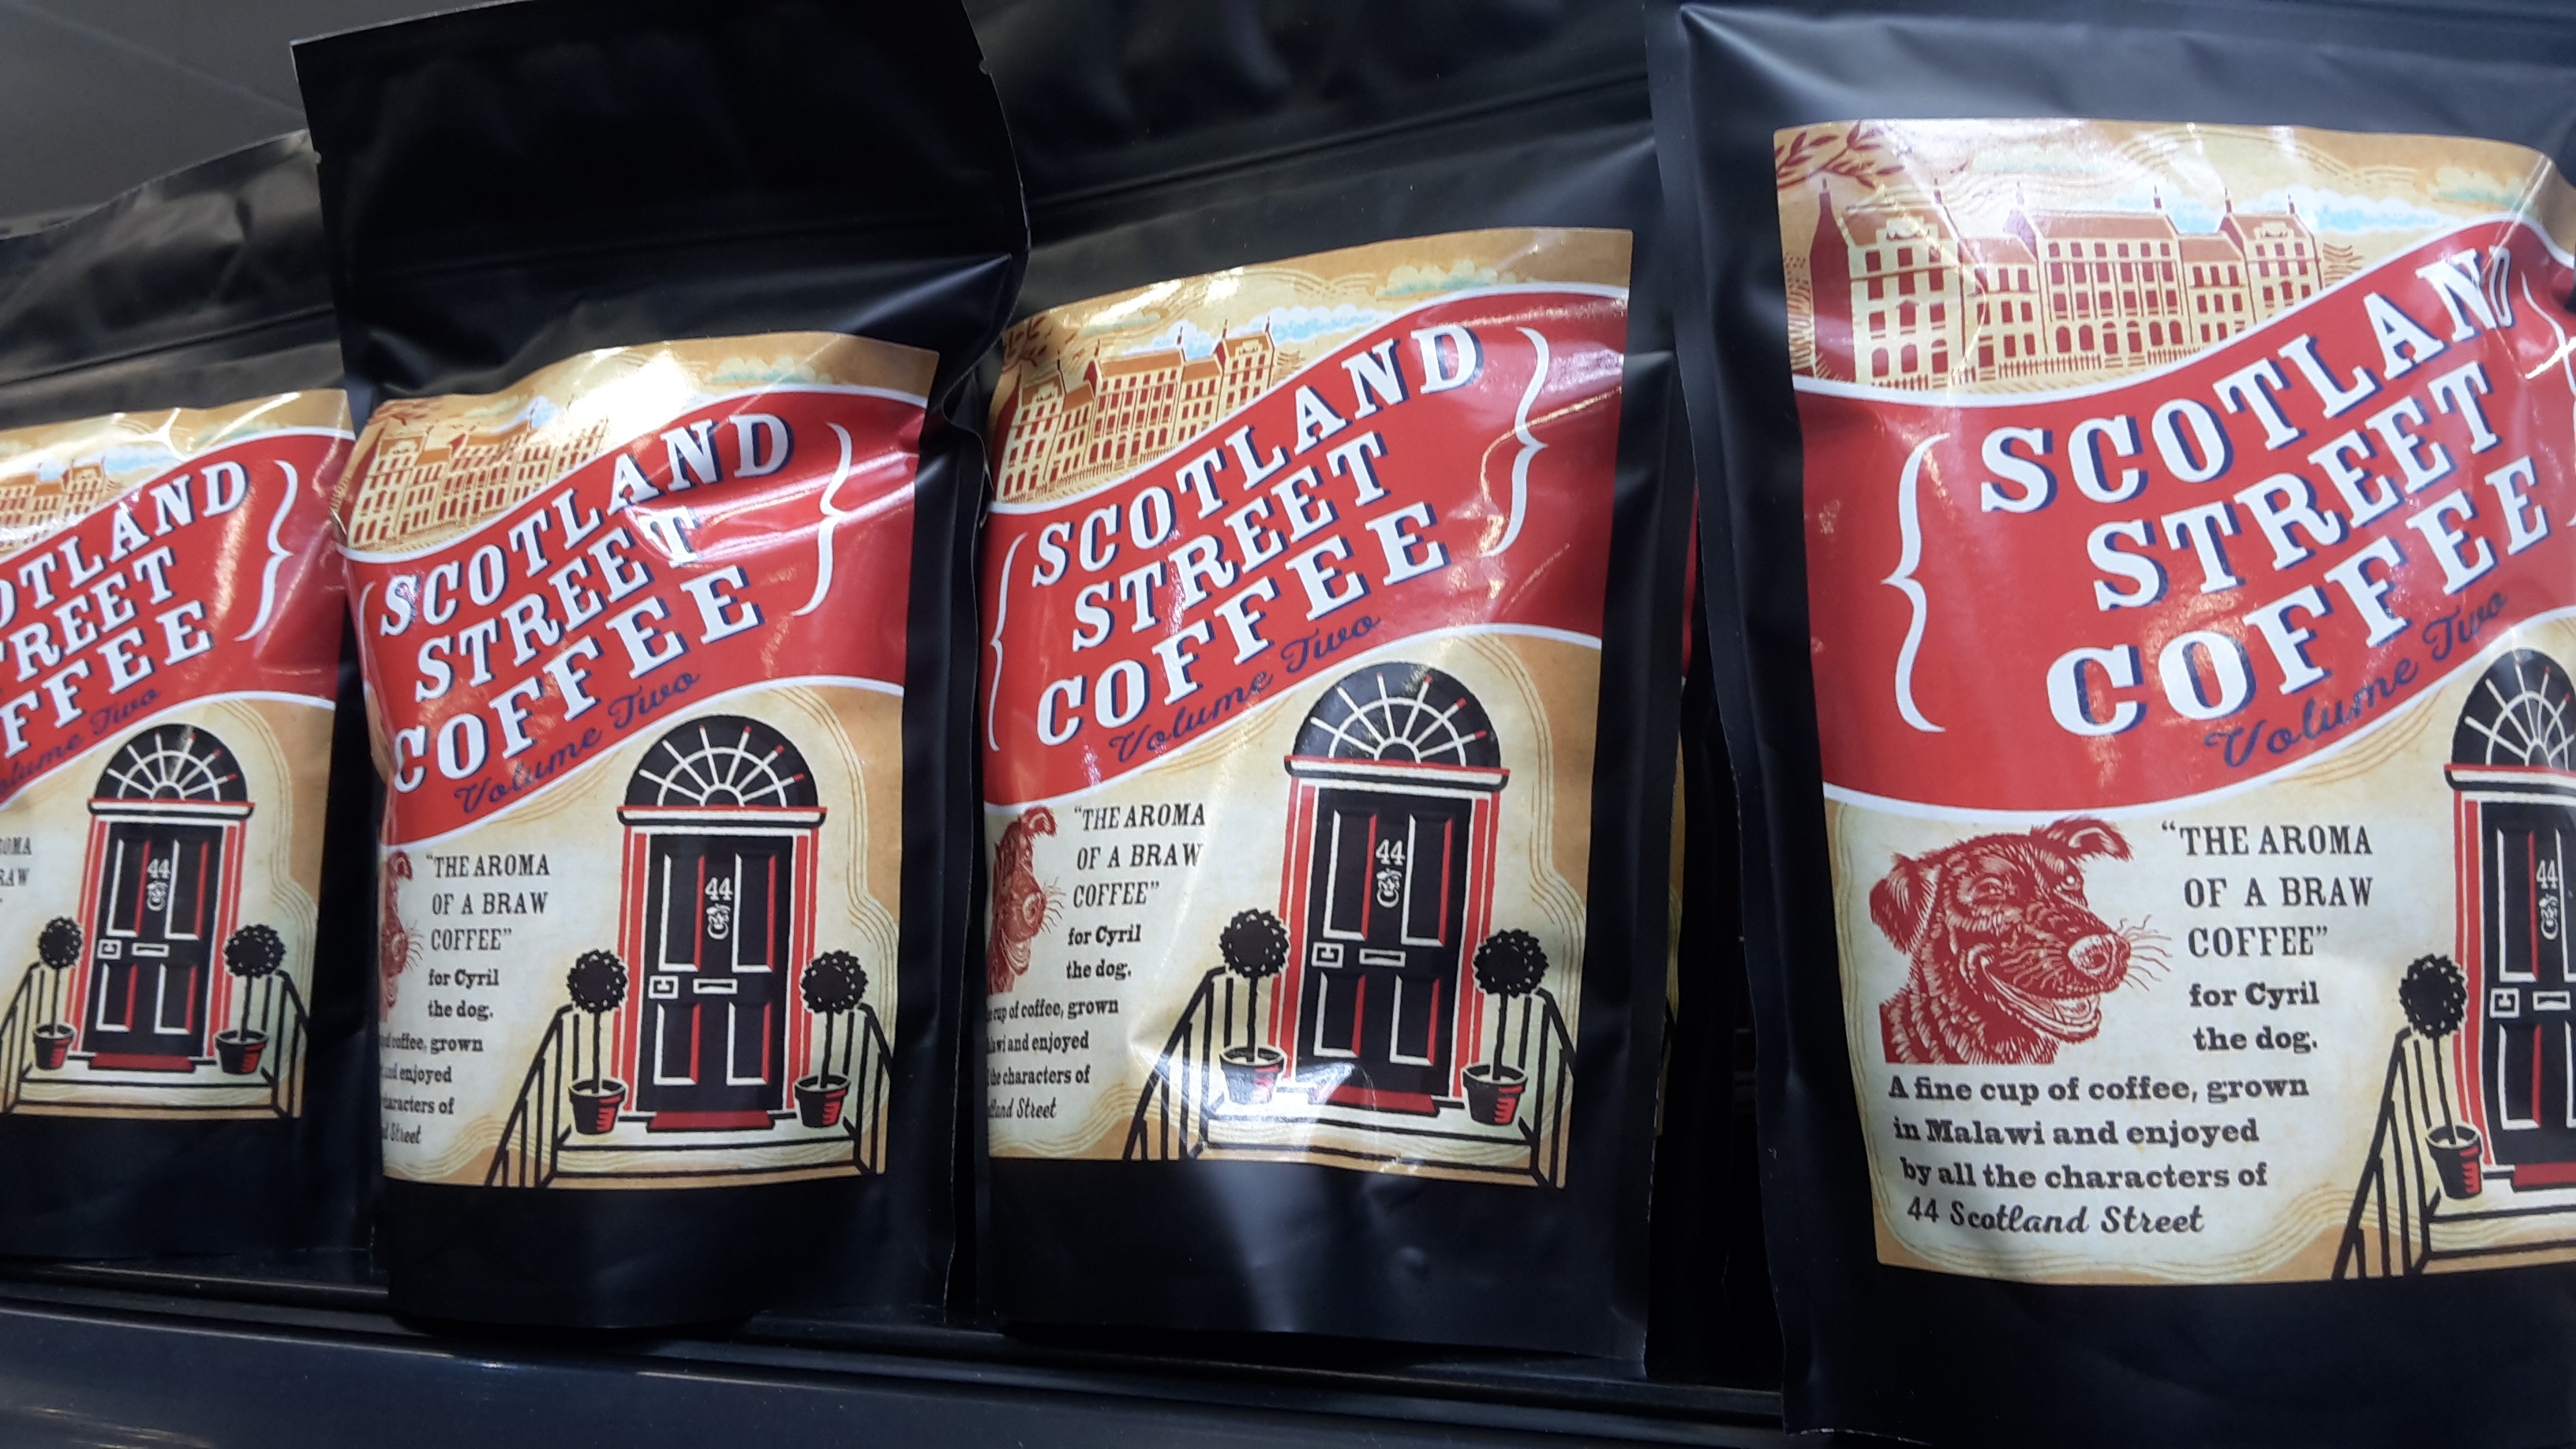 Scotland Street Coffee